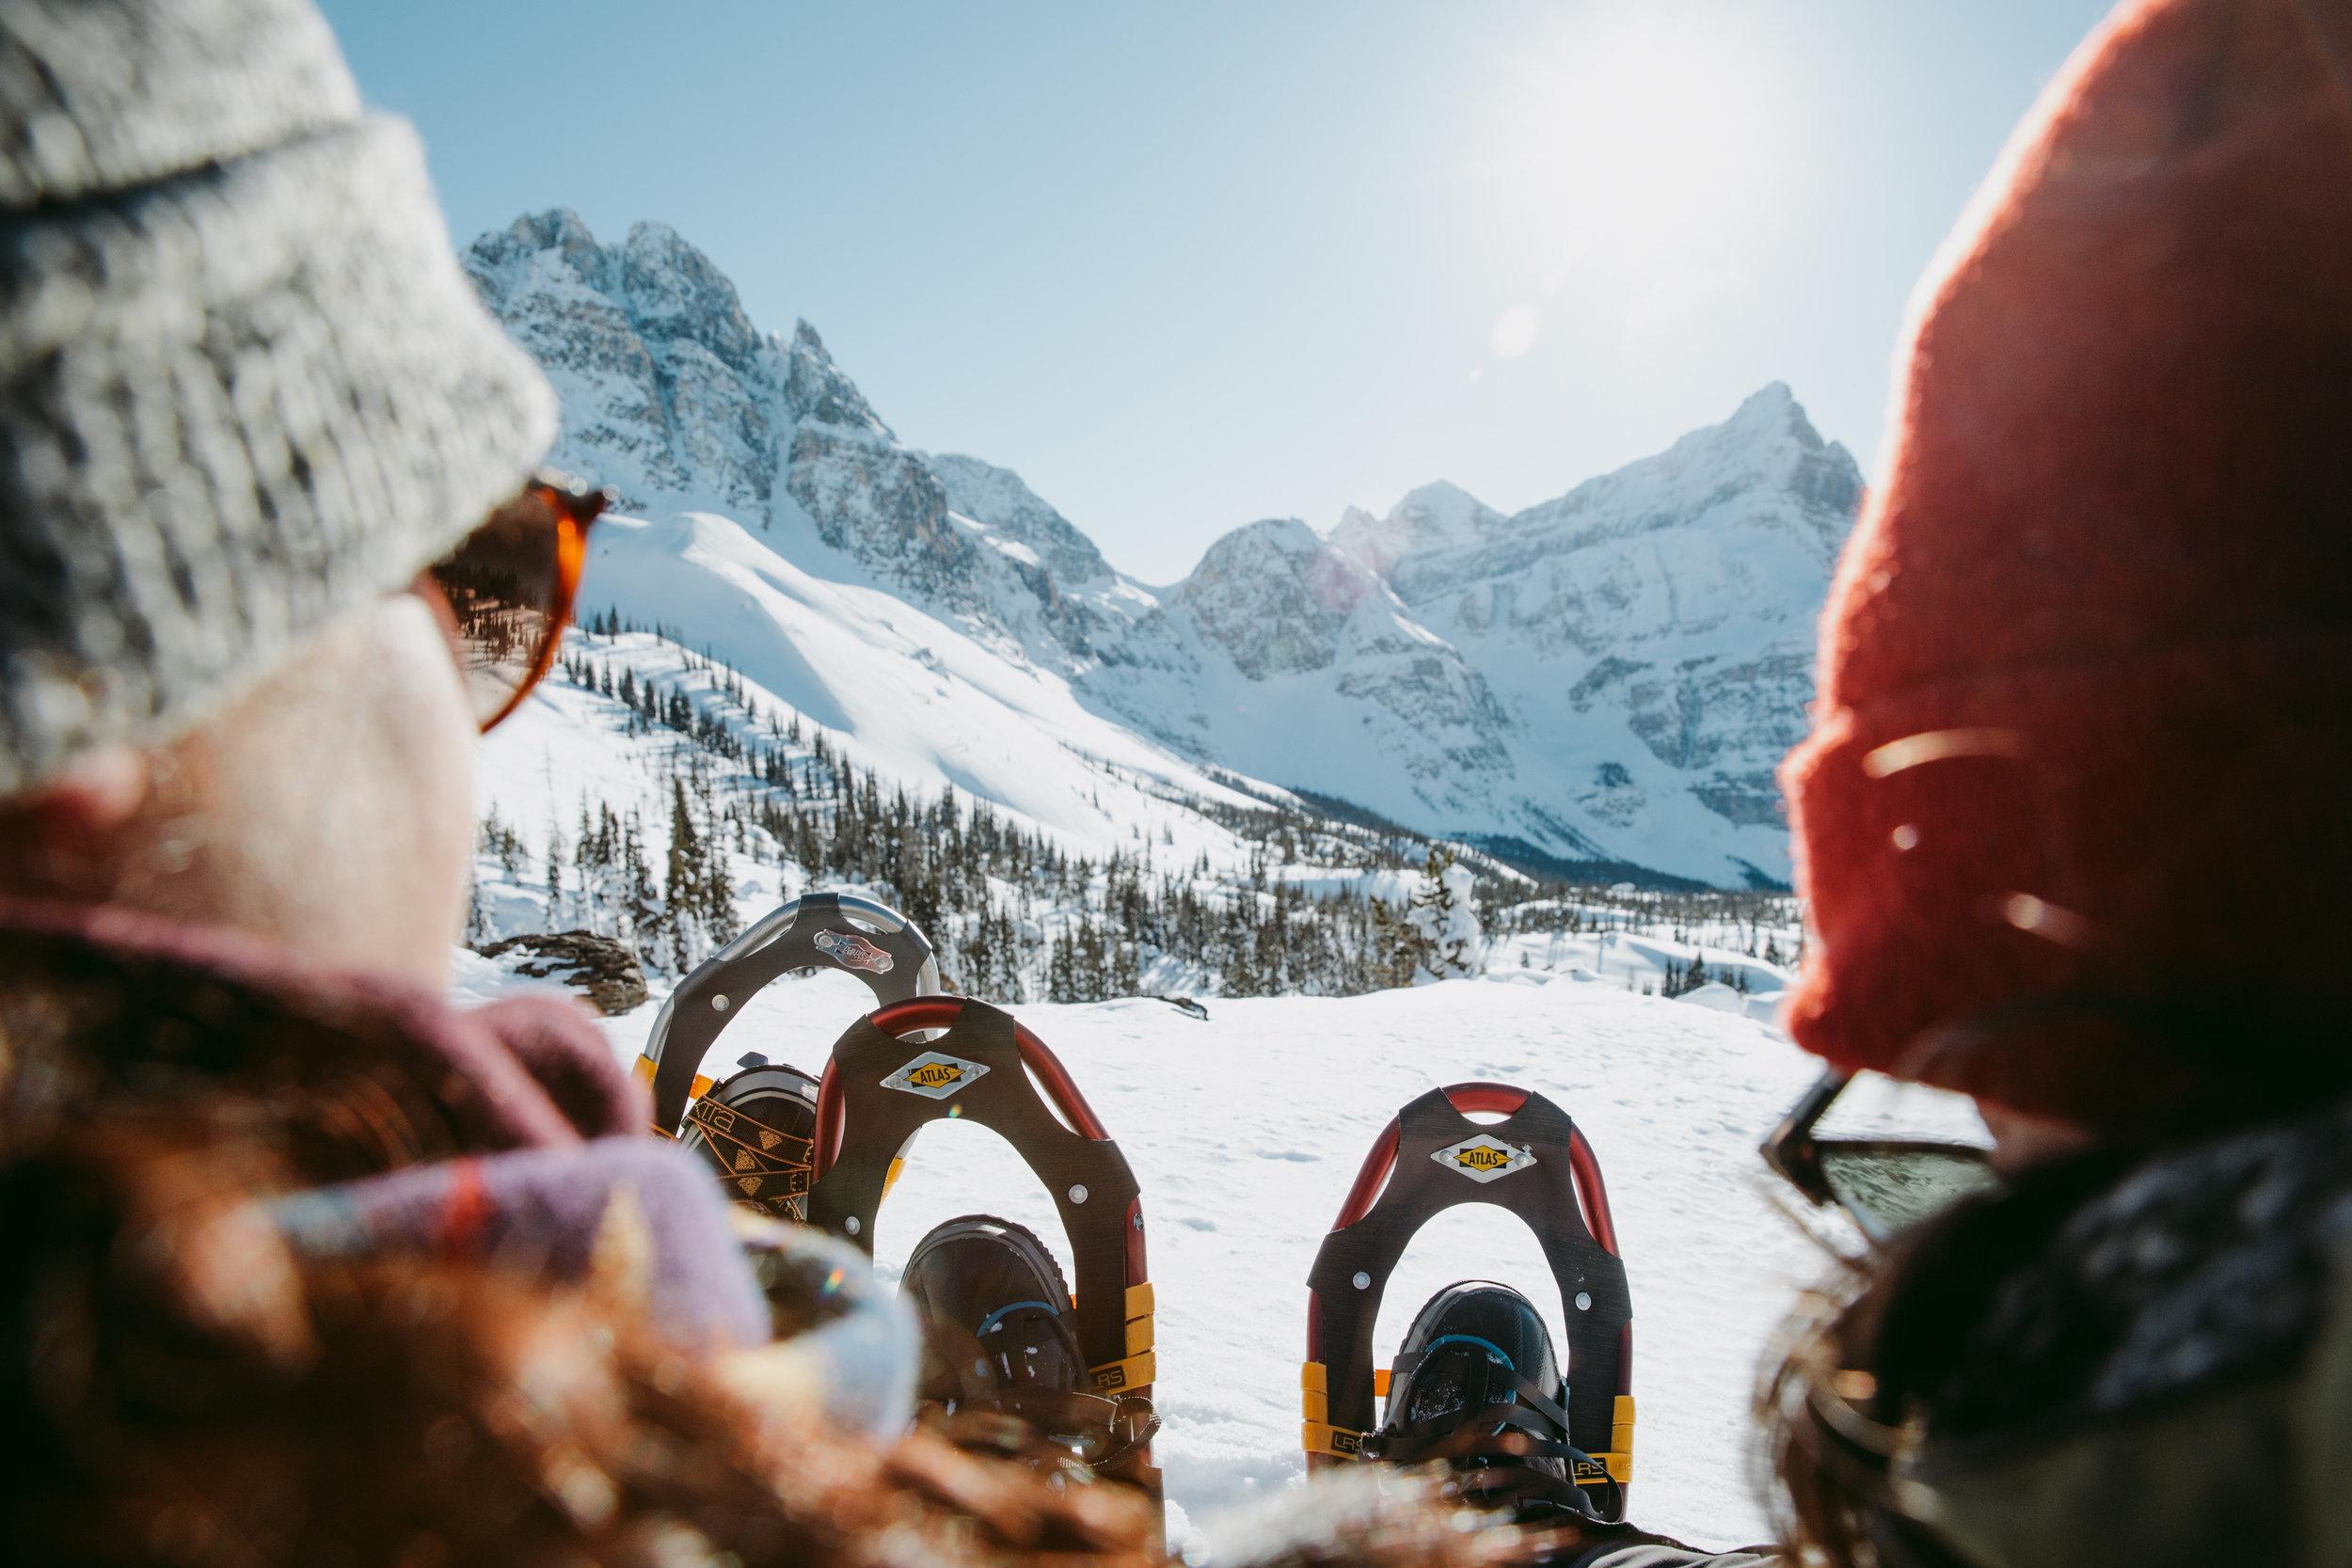 MikeSeehagel-TravelAlberta-Ready-Rebrand_Canada-LifestylePhotography_37.jpg